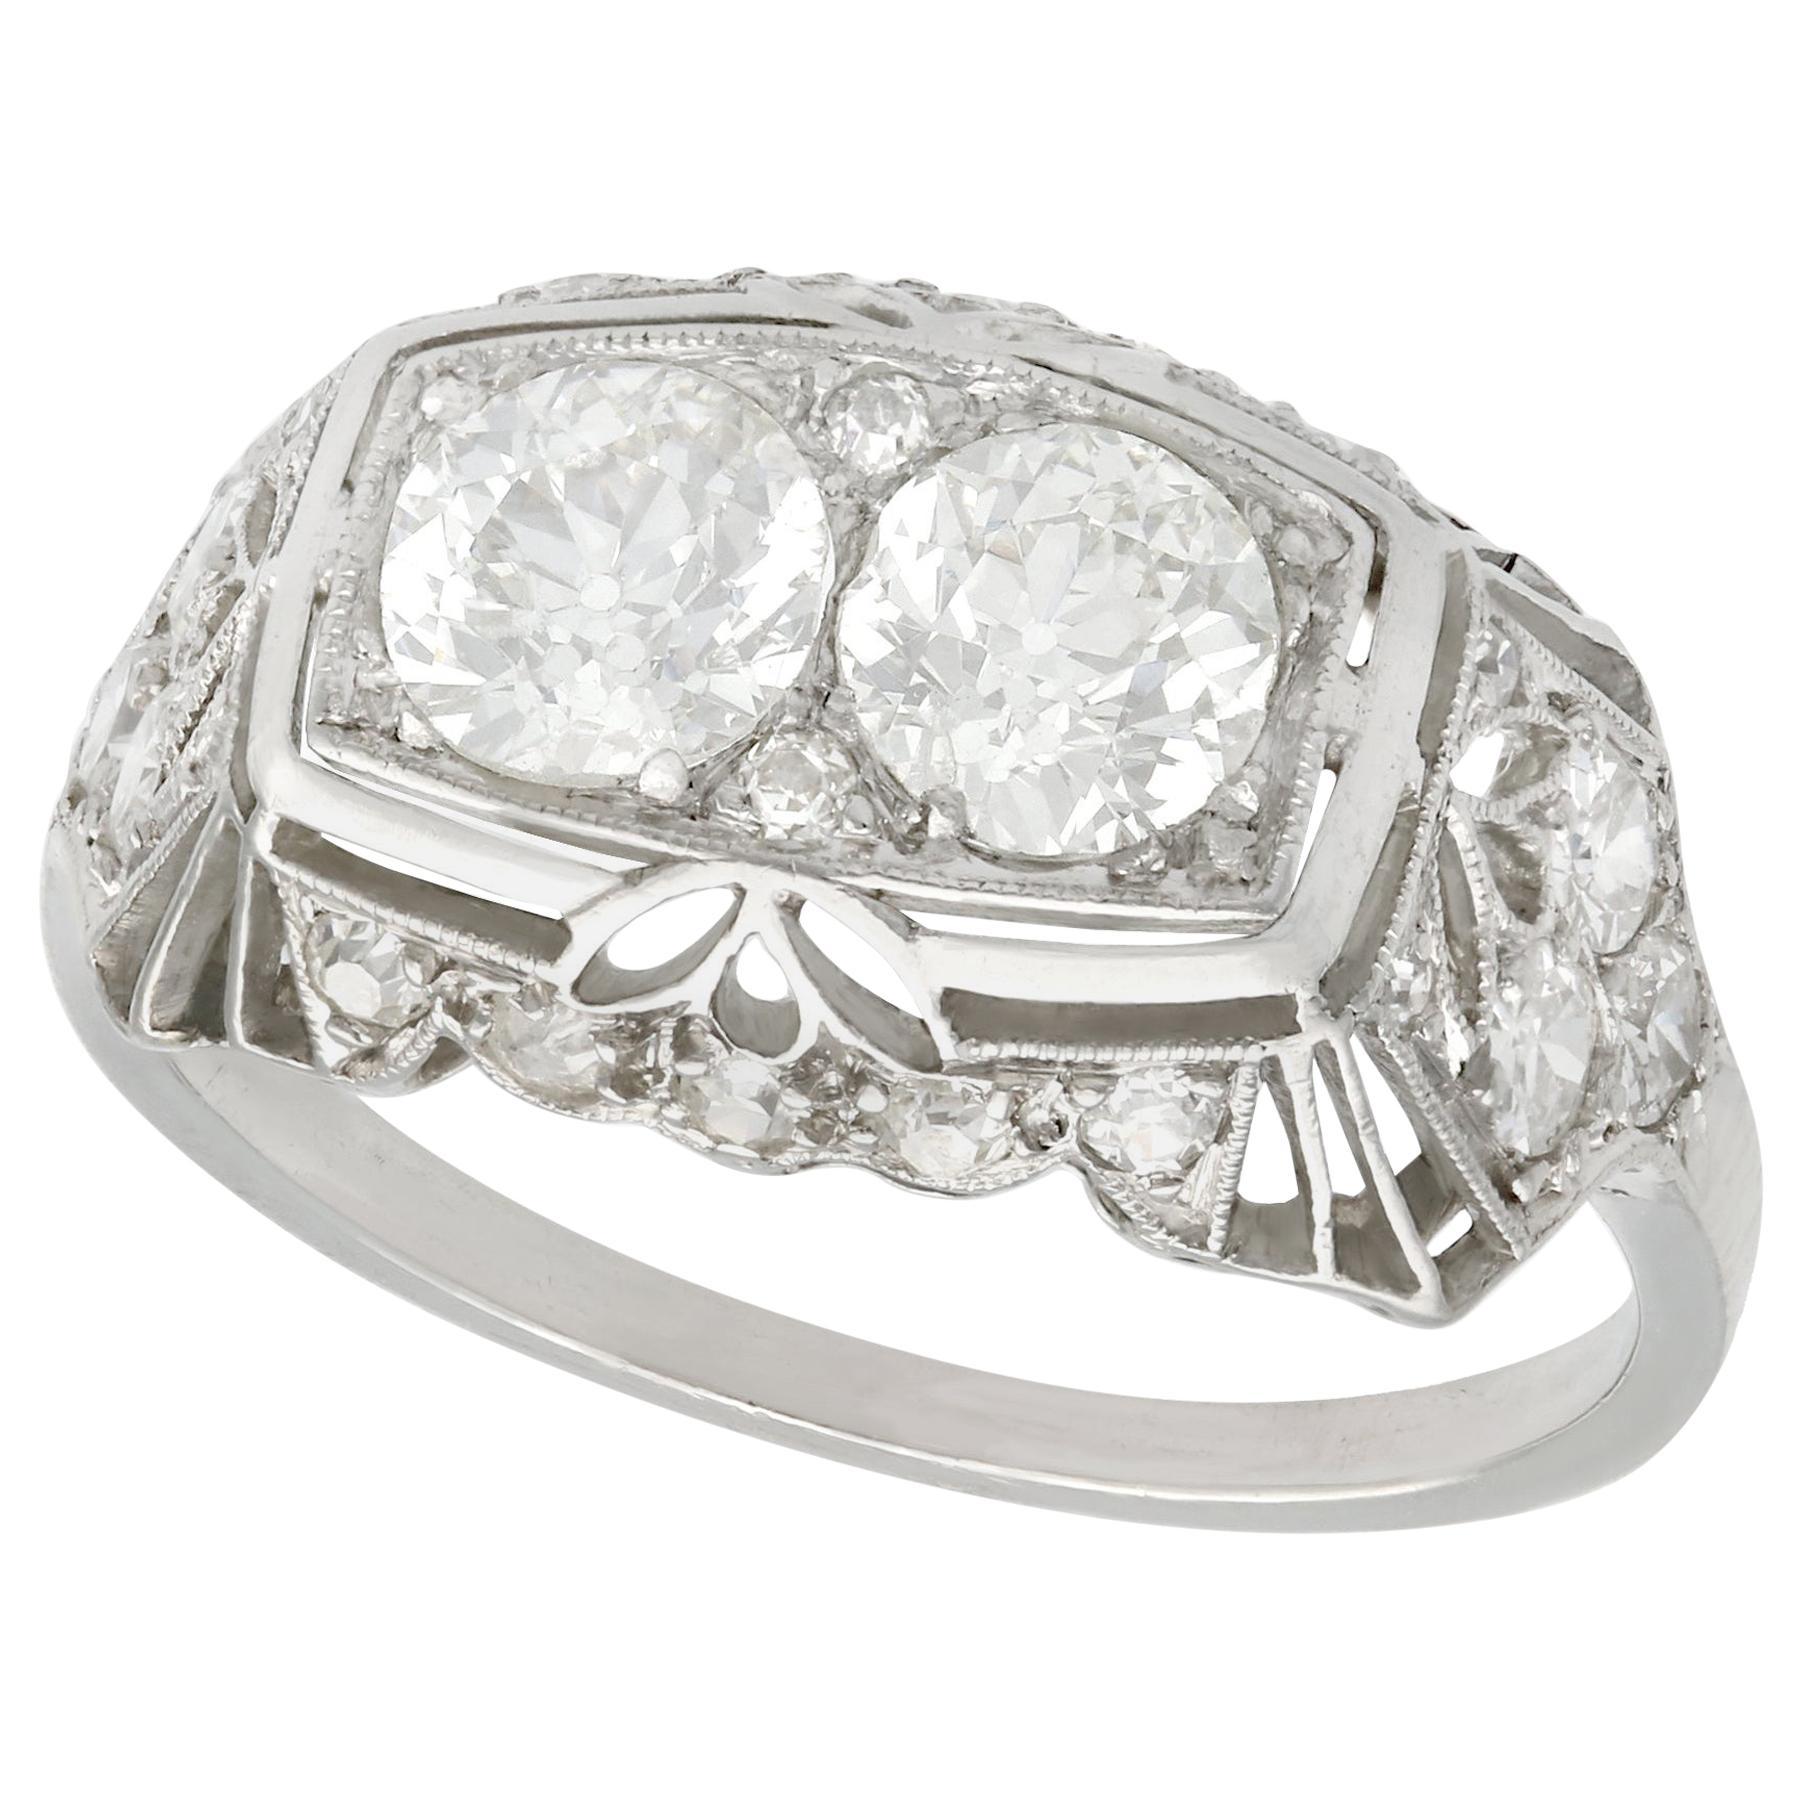 1940s 1.73 Carat Diamond and Platinum Cocktail Ring